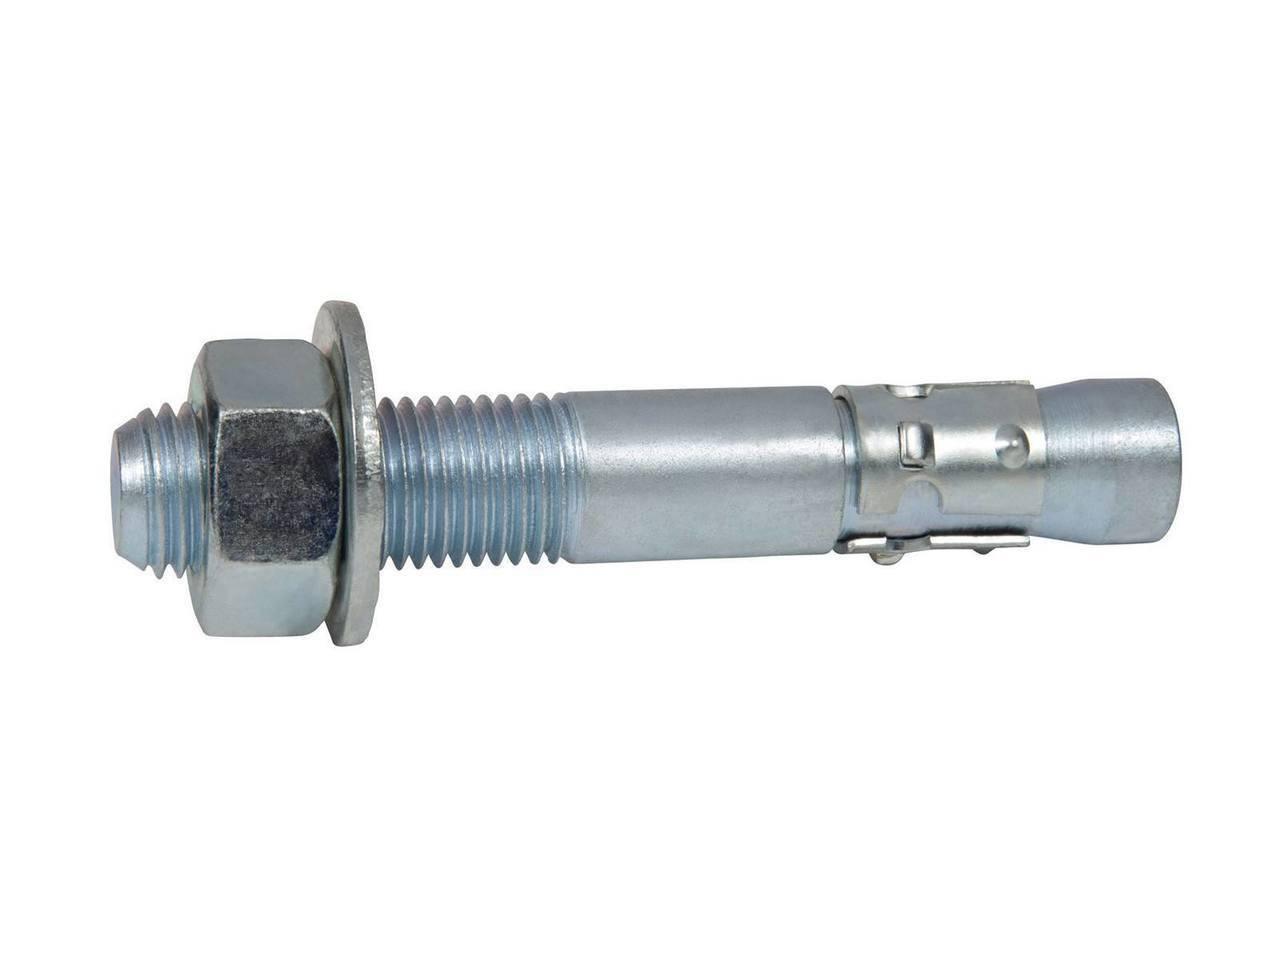 1//4-20 X 2 Zinc Plated Threaded Rod Studs Box of 100